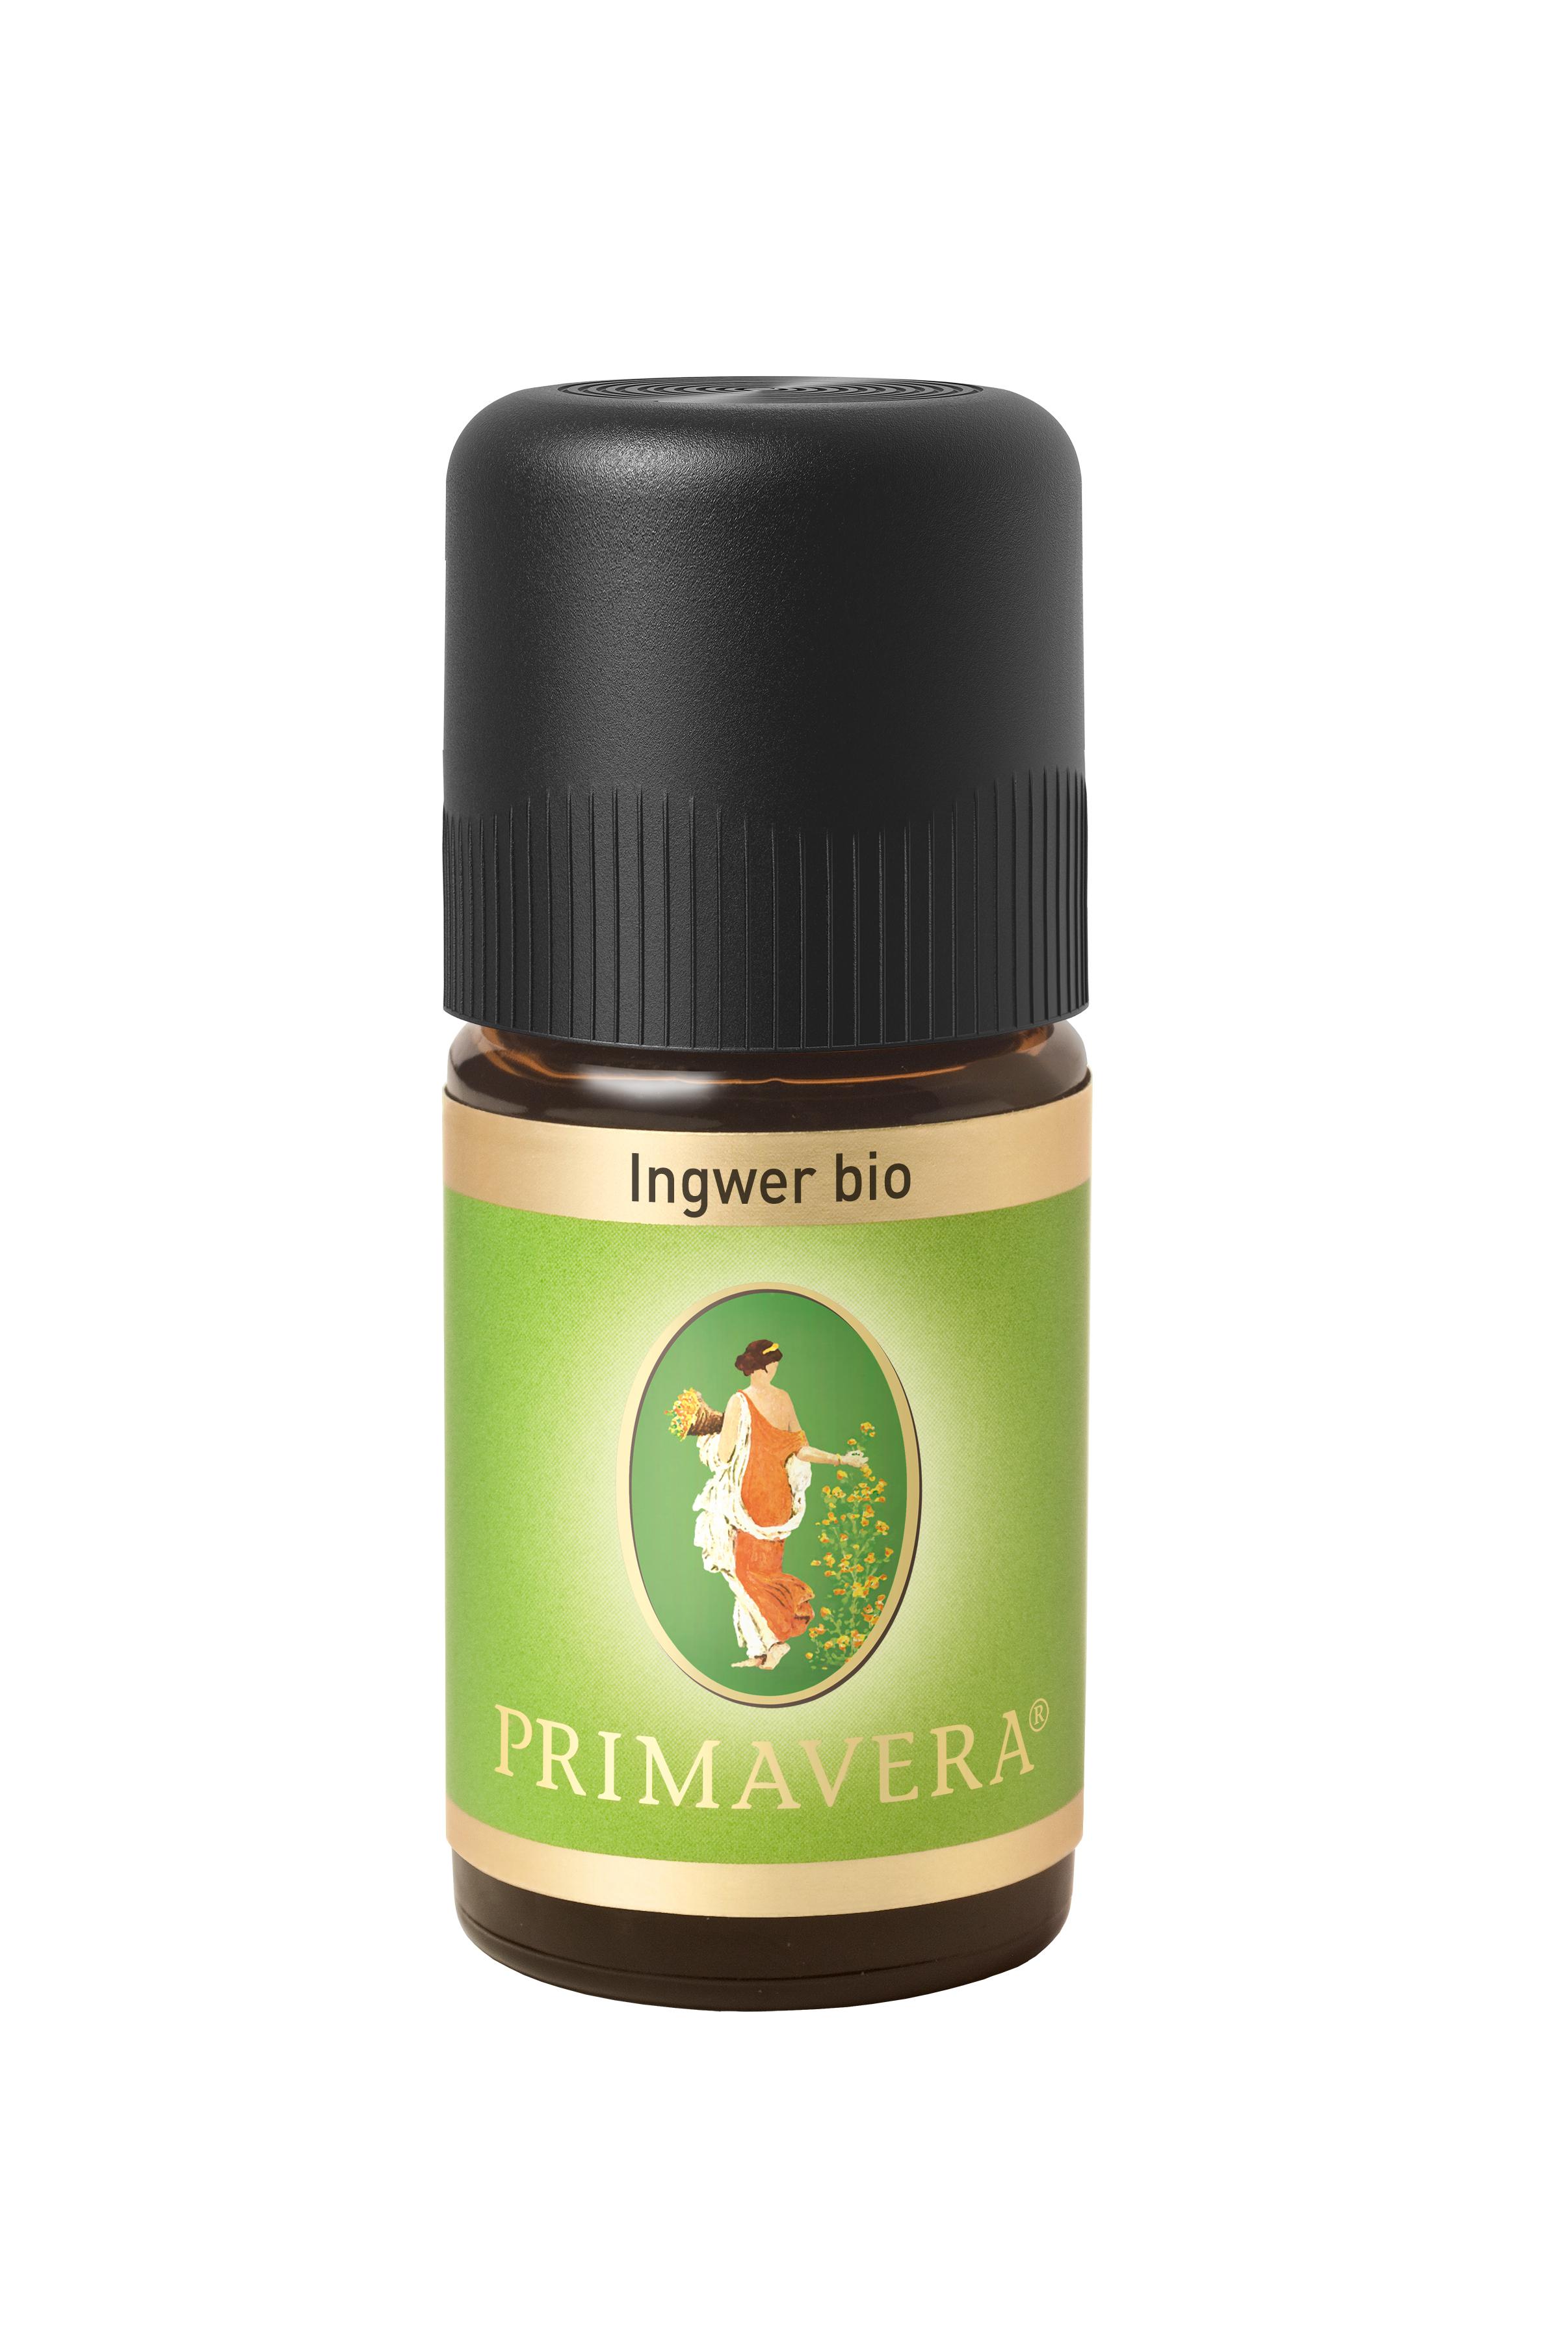 PRIMAVERA Ingwer bio 5 ml